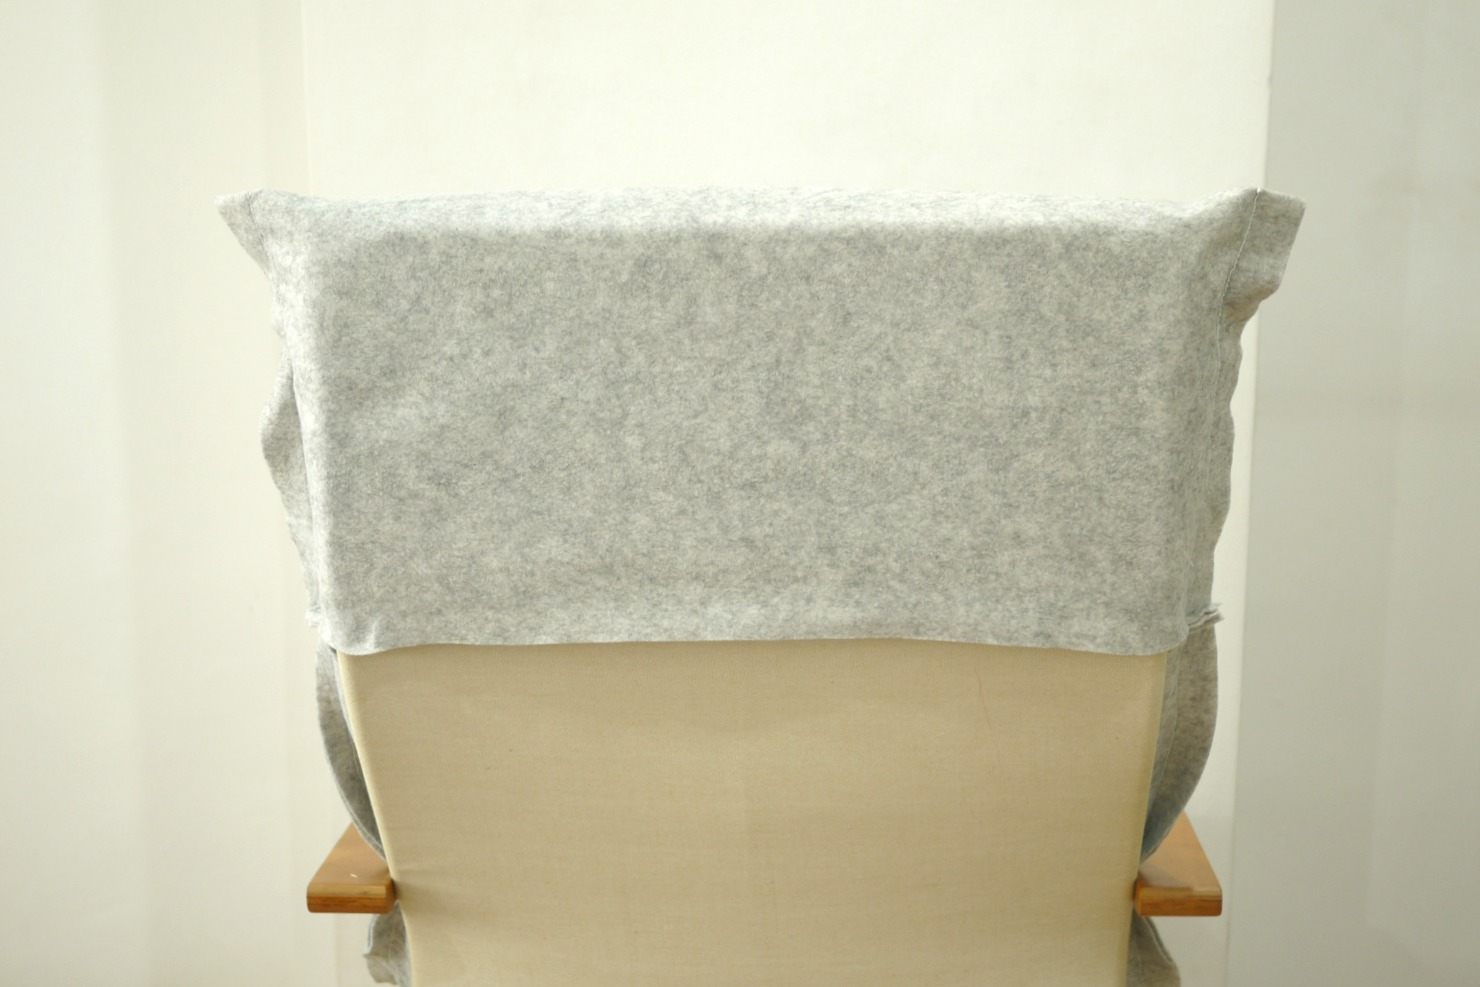 MAKE DIY Ikea PelloPoang Chair Felt Cover  MAKING IT